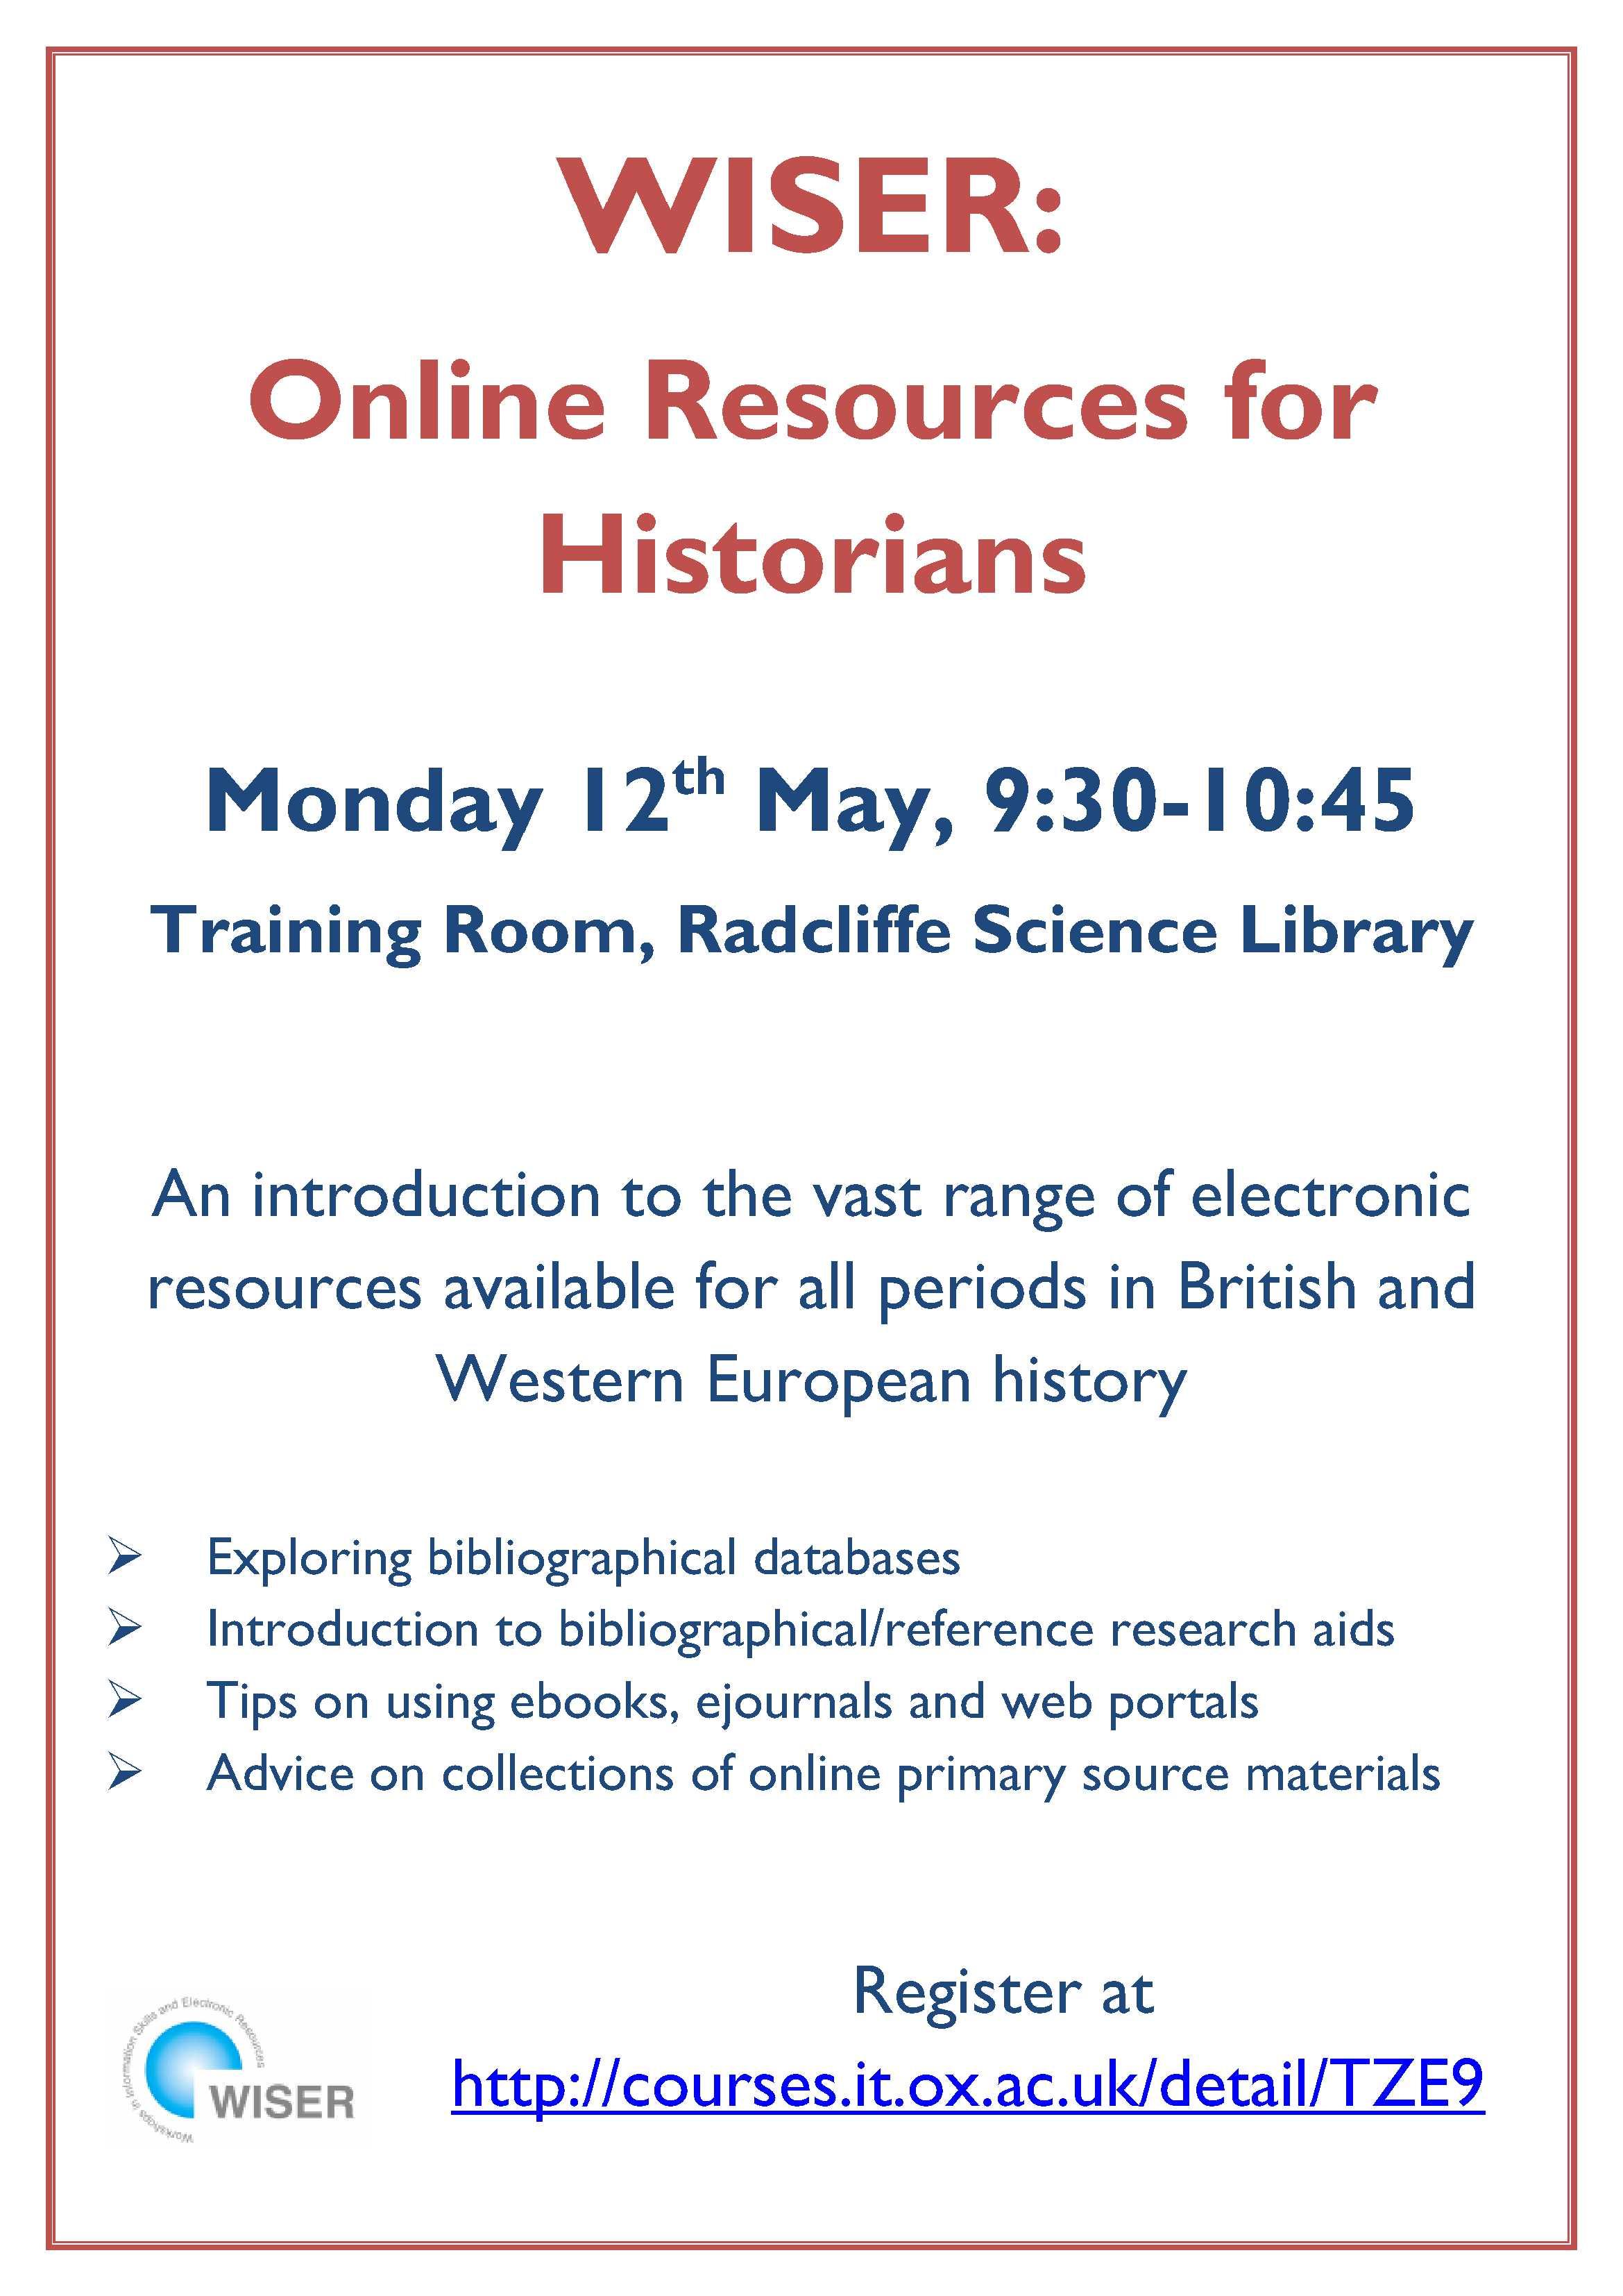 WISER Online Resources poster